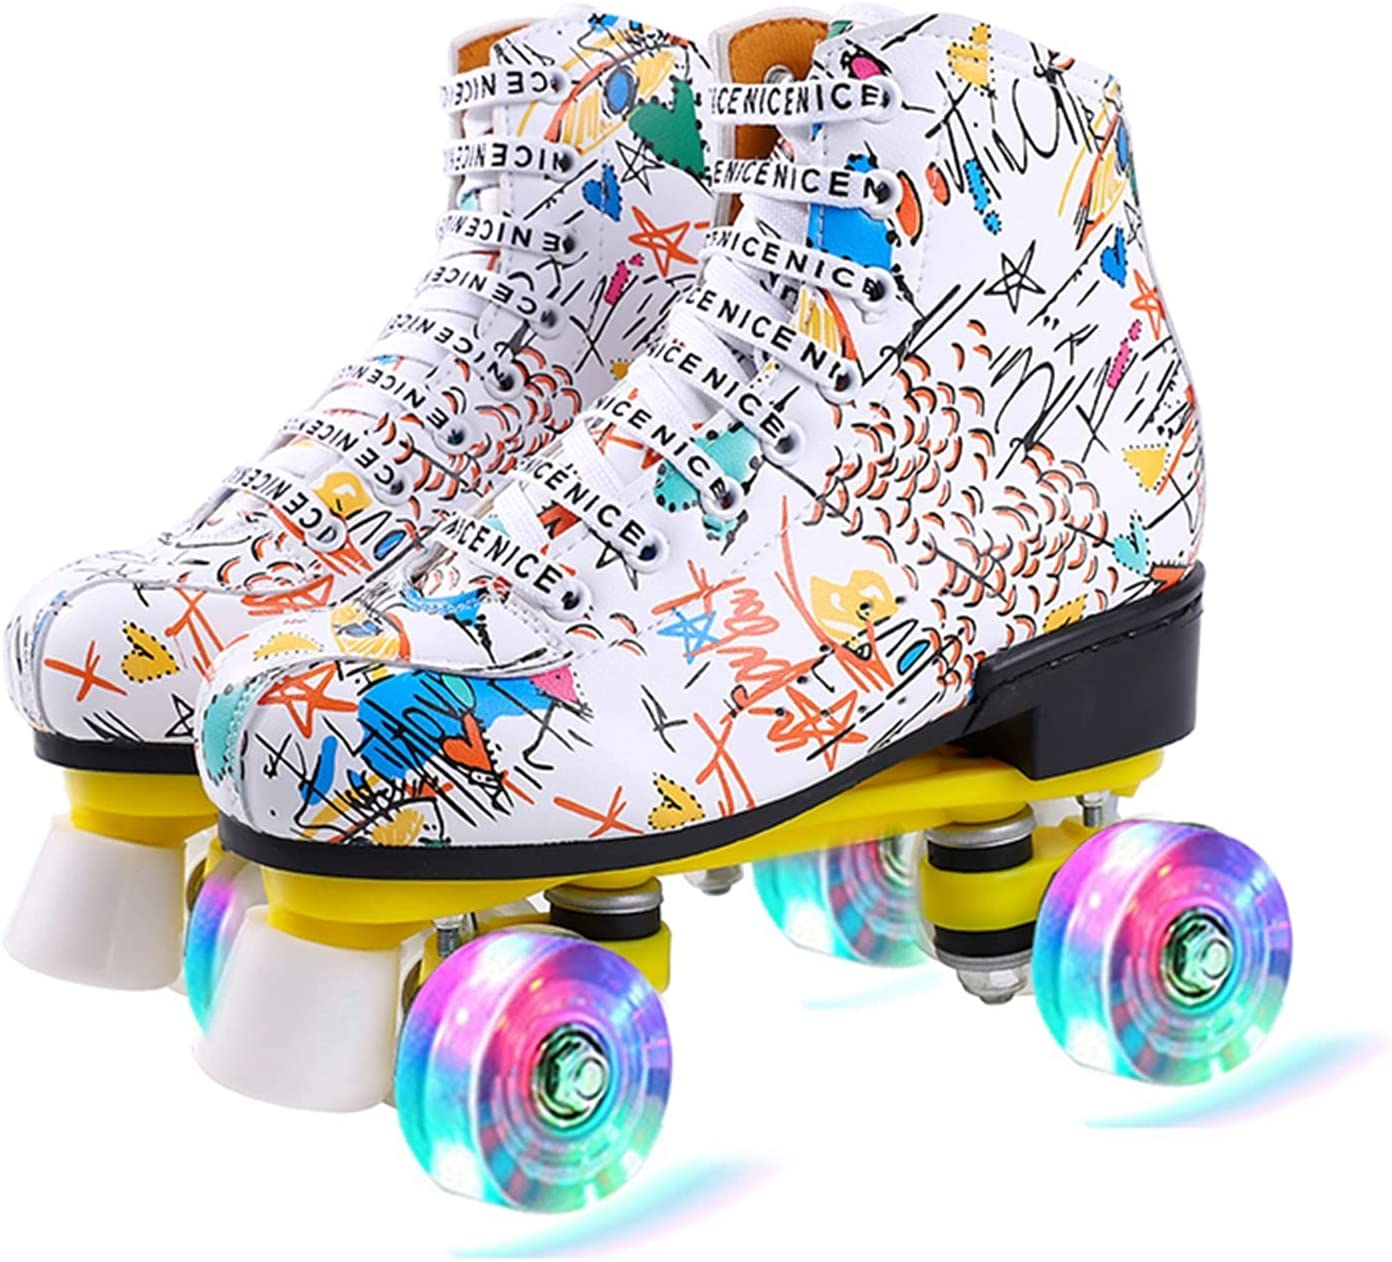 CHENGSYSTE Inline New Shipping Free Skates Women 6 Ska Microfiber Max 52% OFF Choice Pu Roller